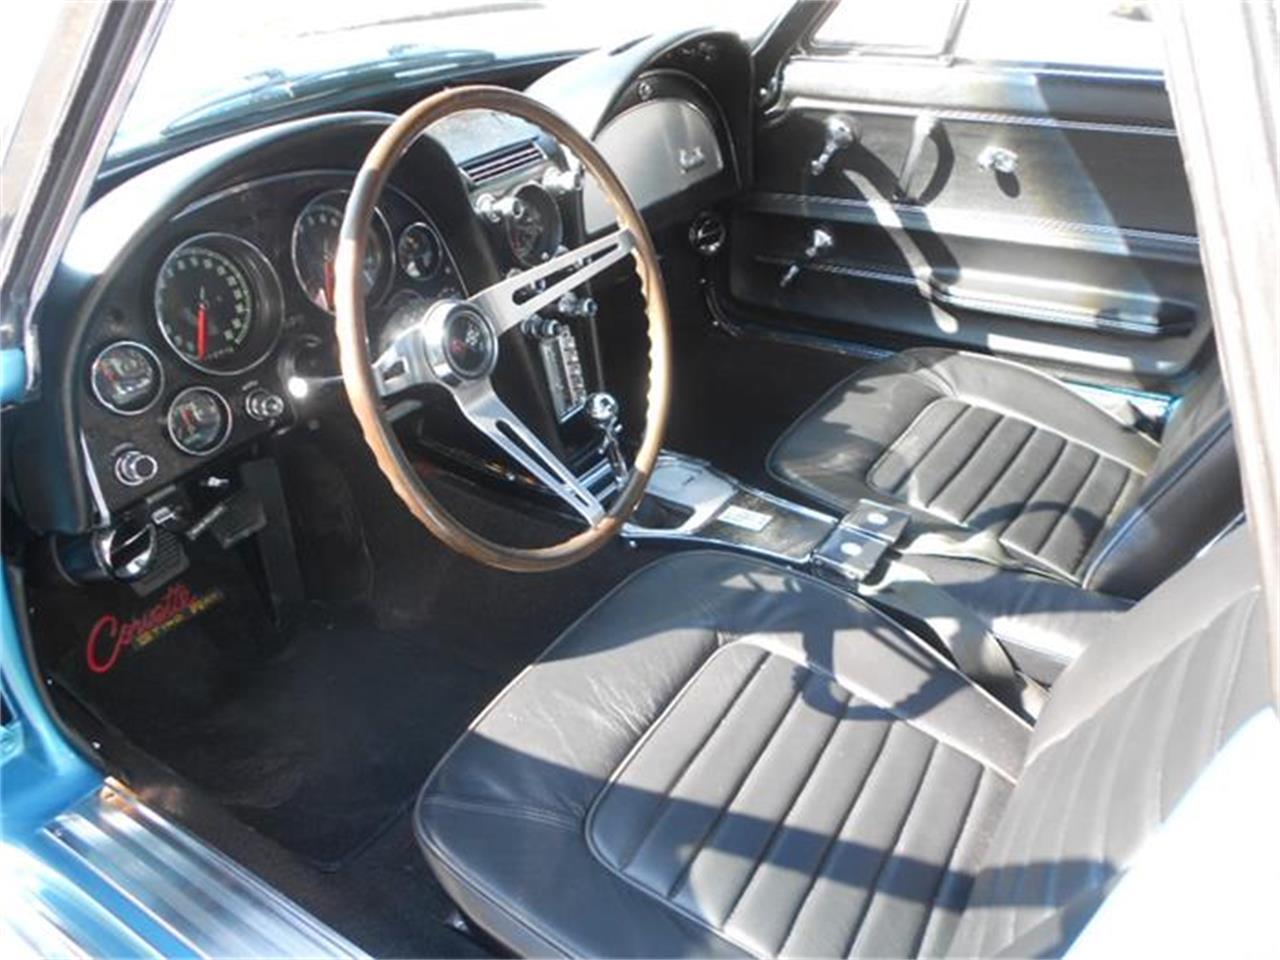 Large Picture of 1966 Chevrolet Corvette - $79,000.00 Offered by D & M Corvette Specialists LTD - B2SE